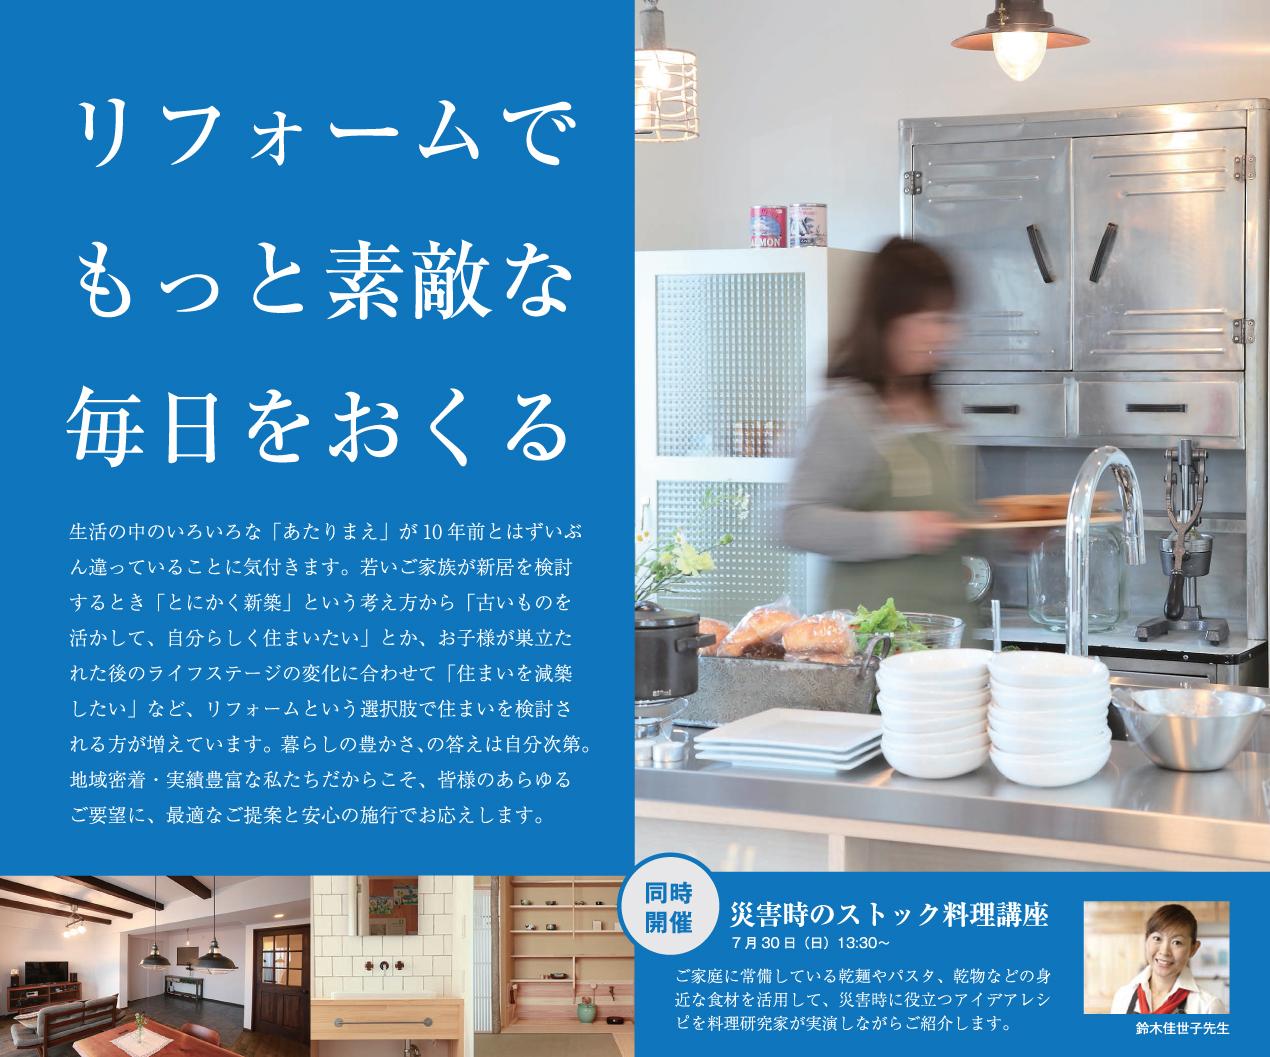 7/29(土)・30(日) リフォーム相談会 @神奈川県藤沢市